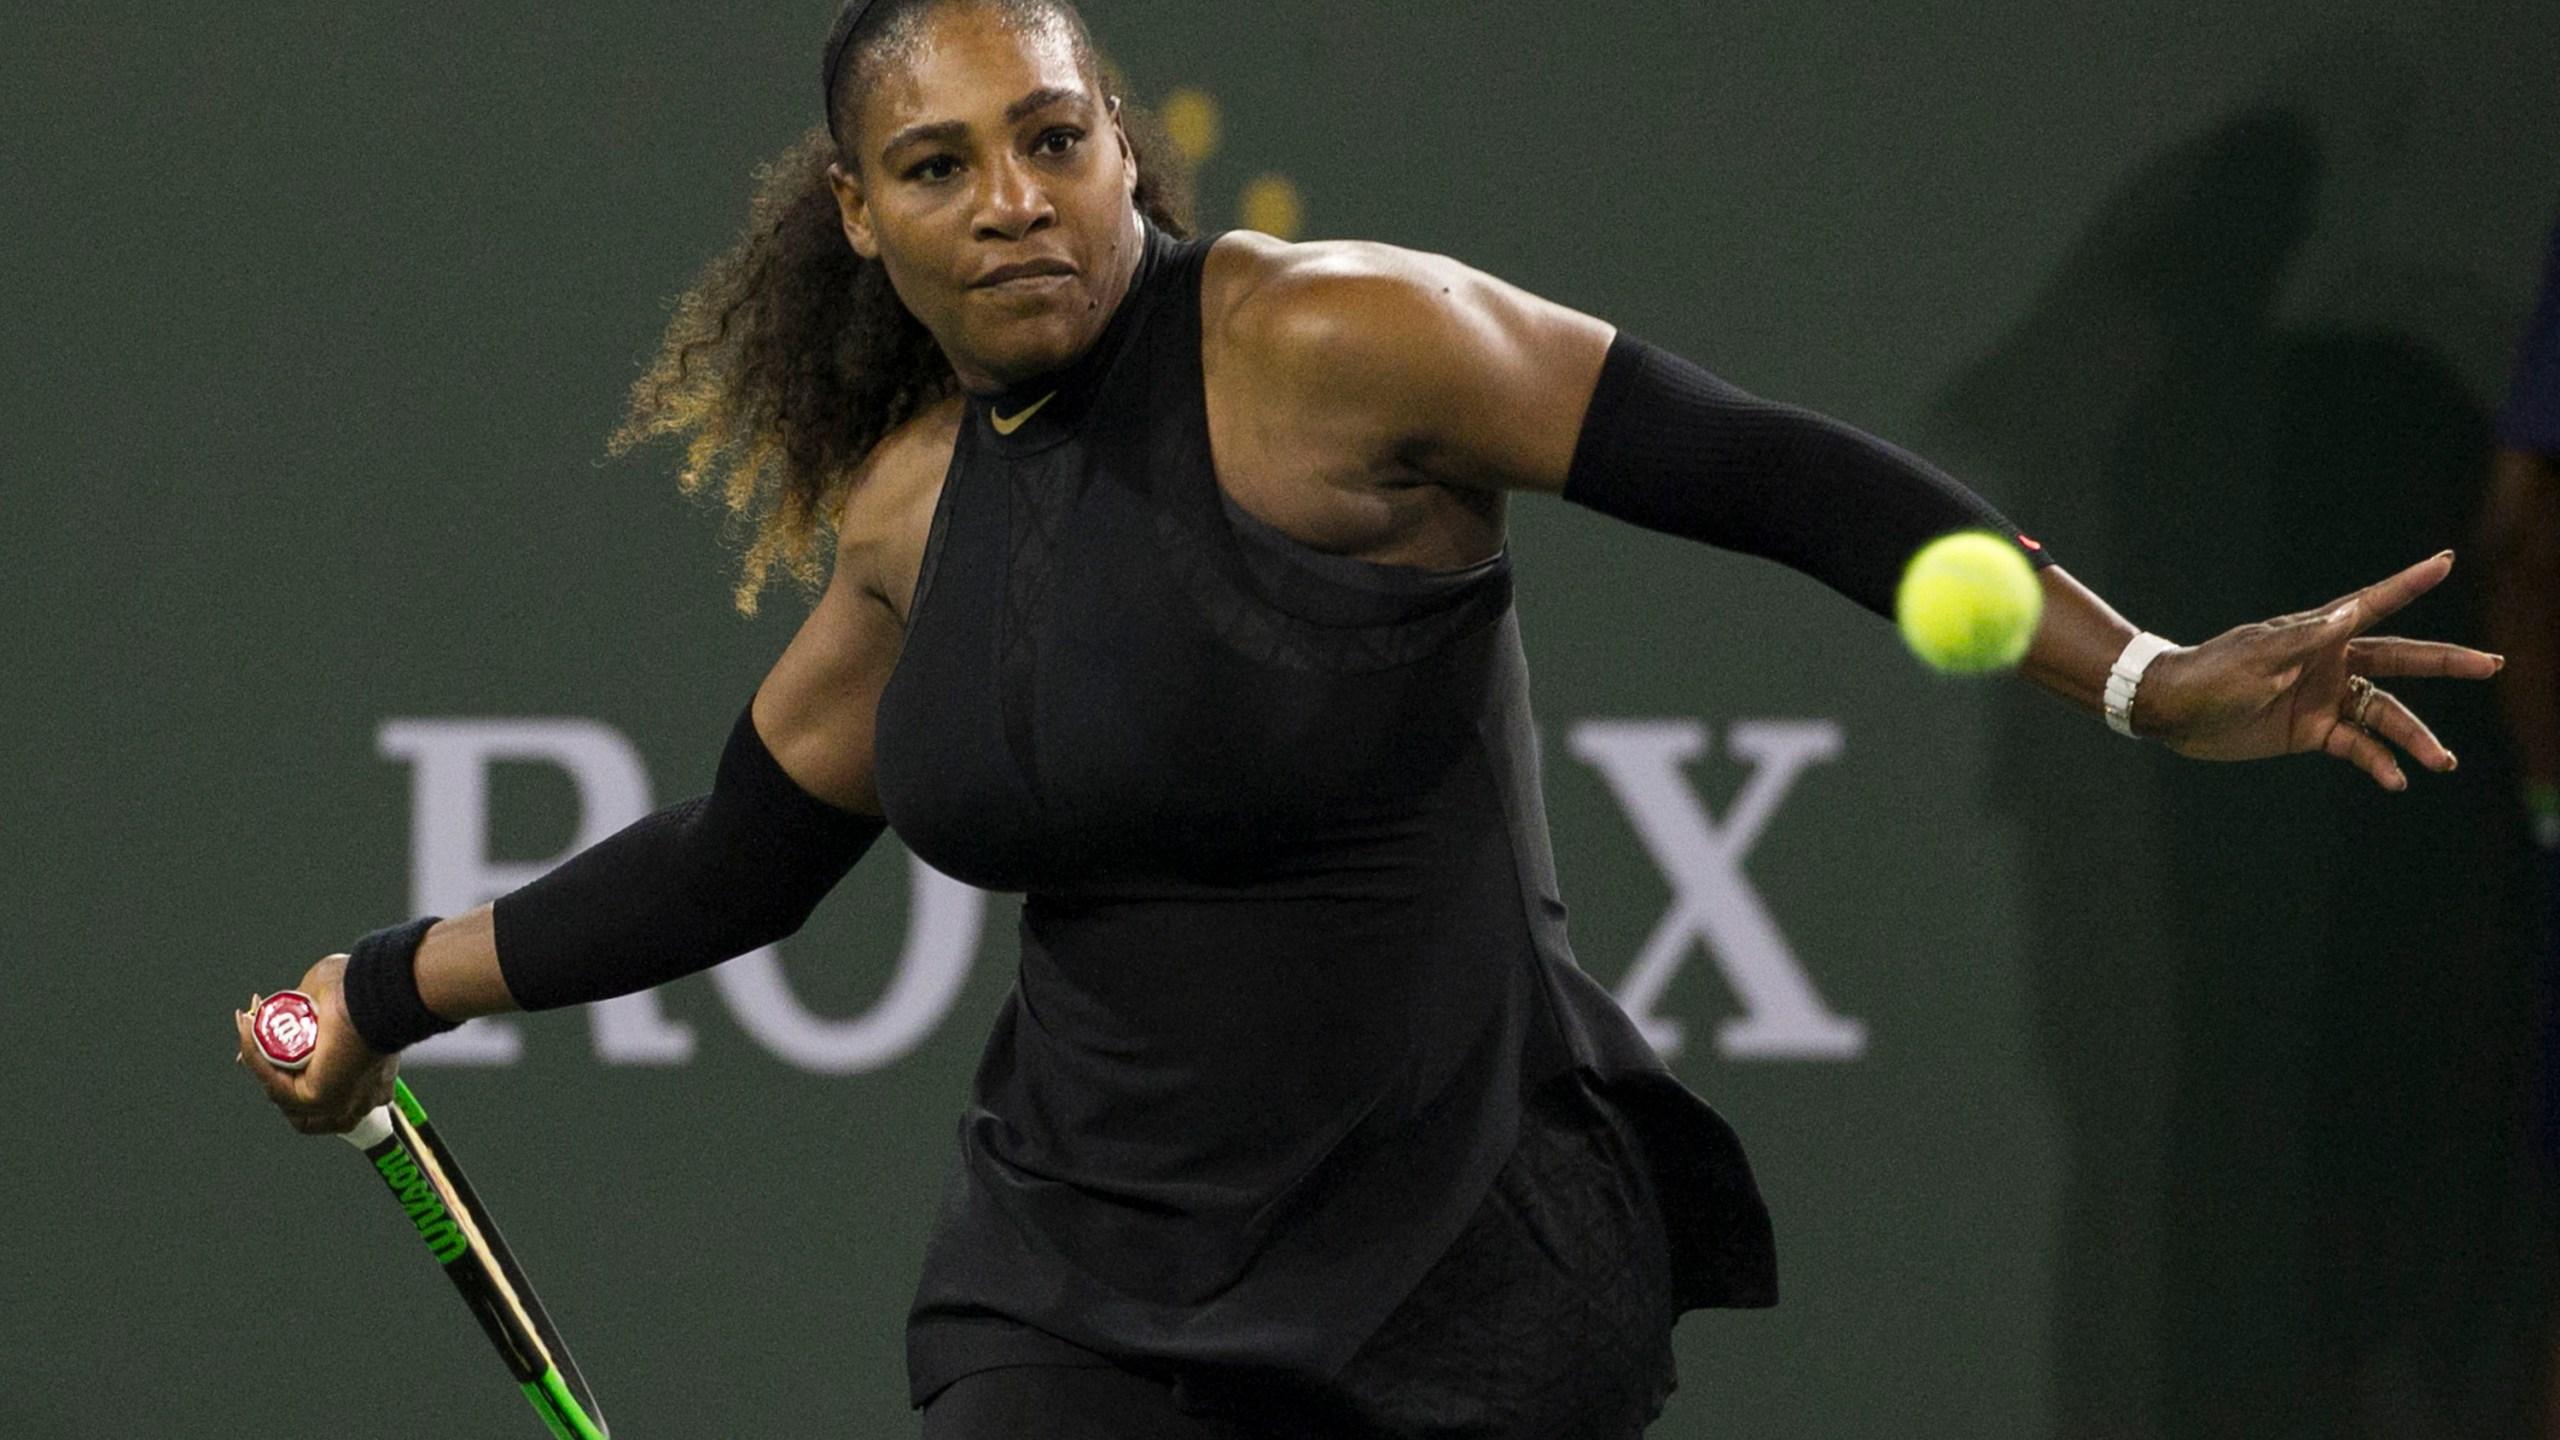 Indian_Wells_Serena_Williams_Tennis_10087-159532.jpg92827029